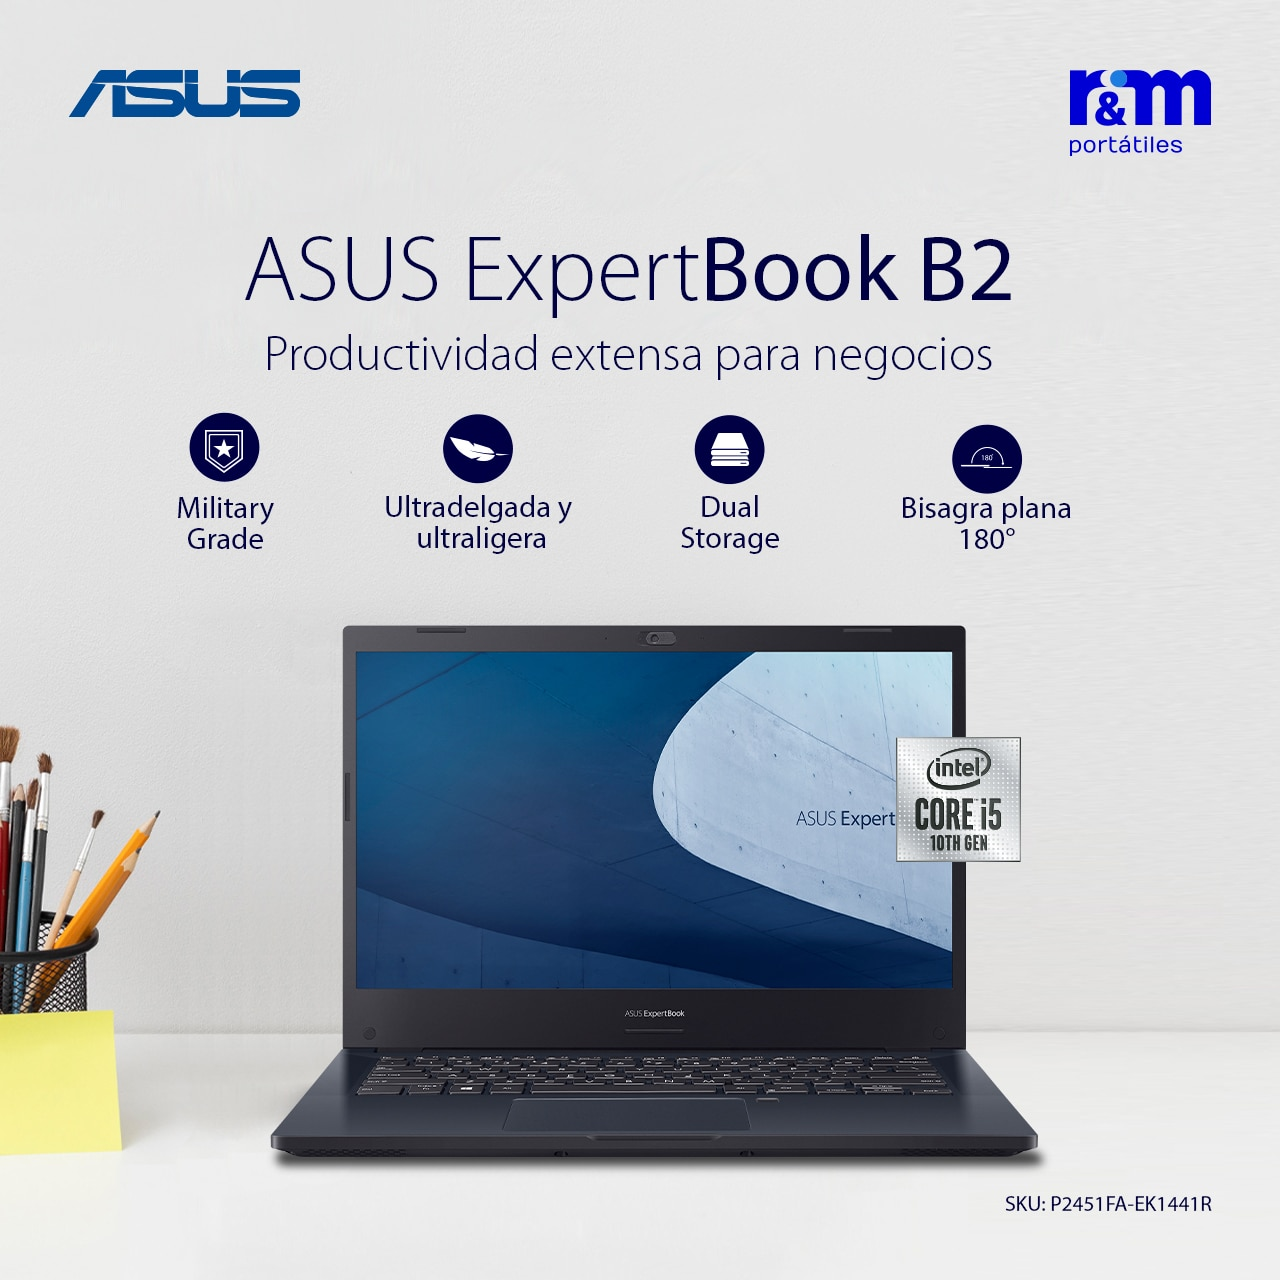 Home - Banner Facebook i5 RYM portatiles - R&M Portátiles